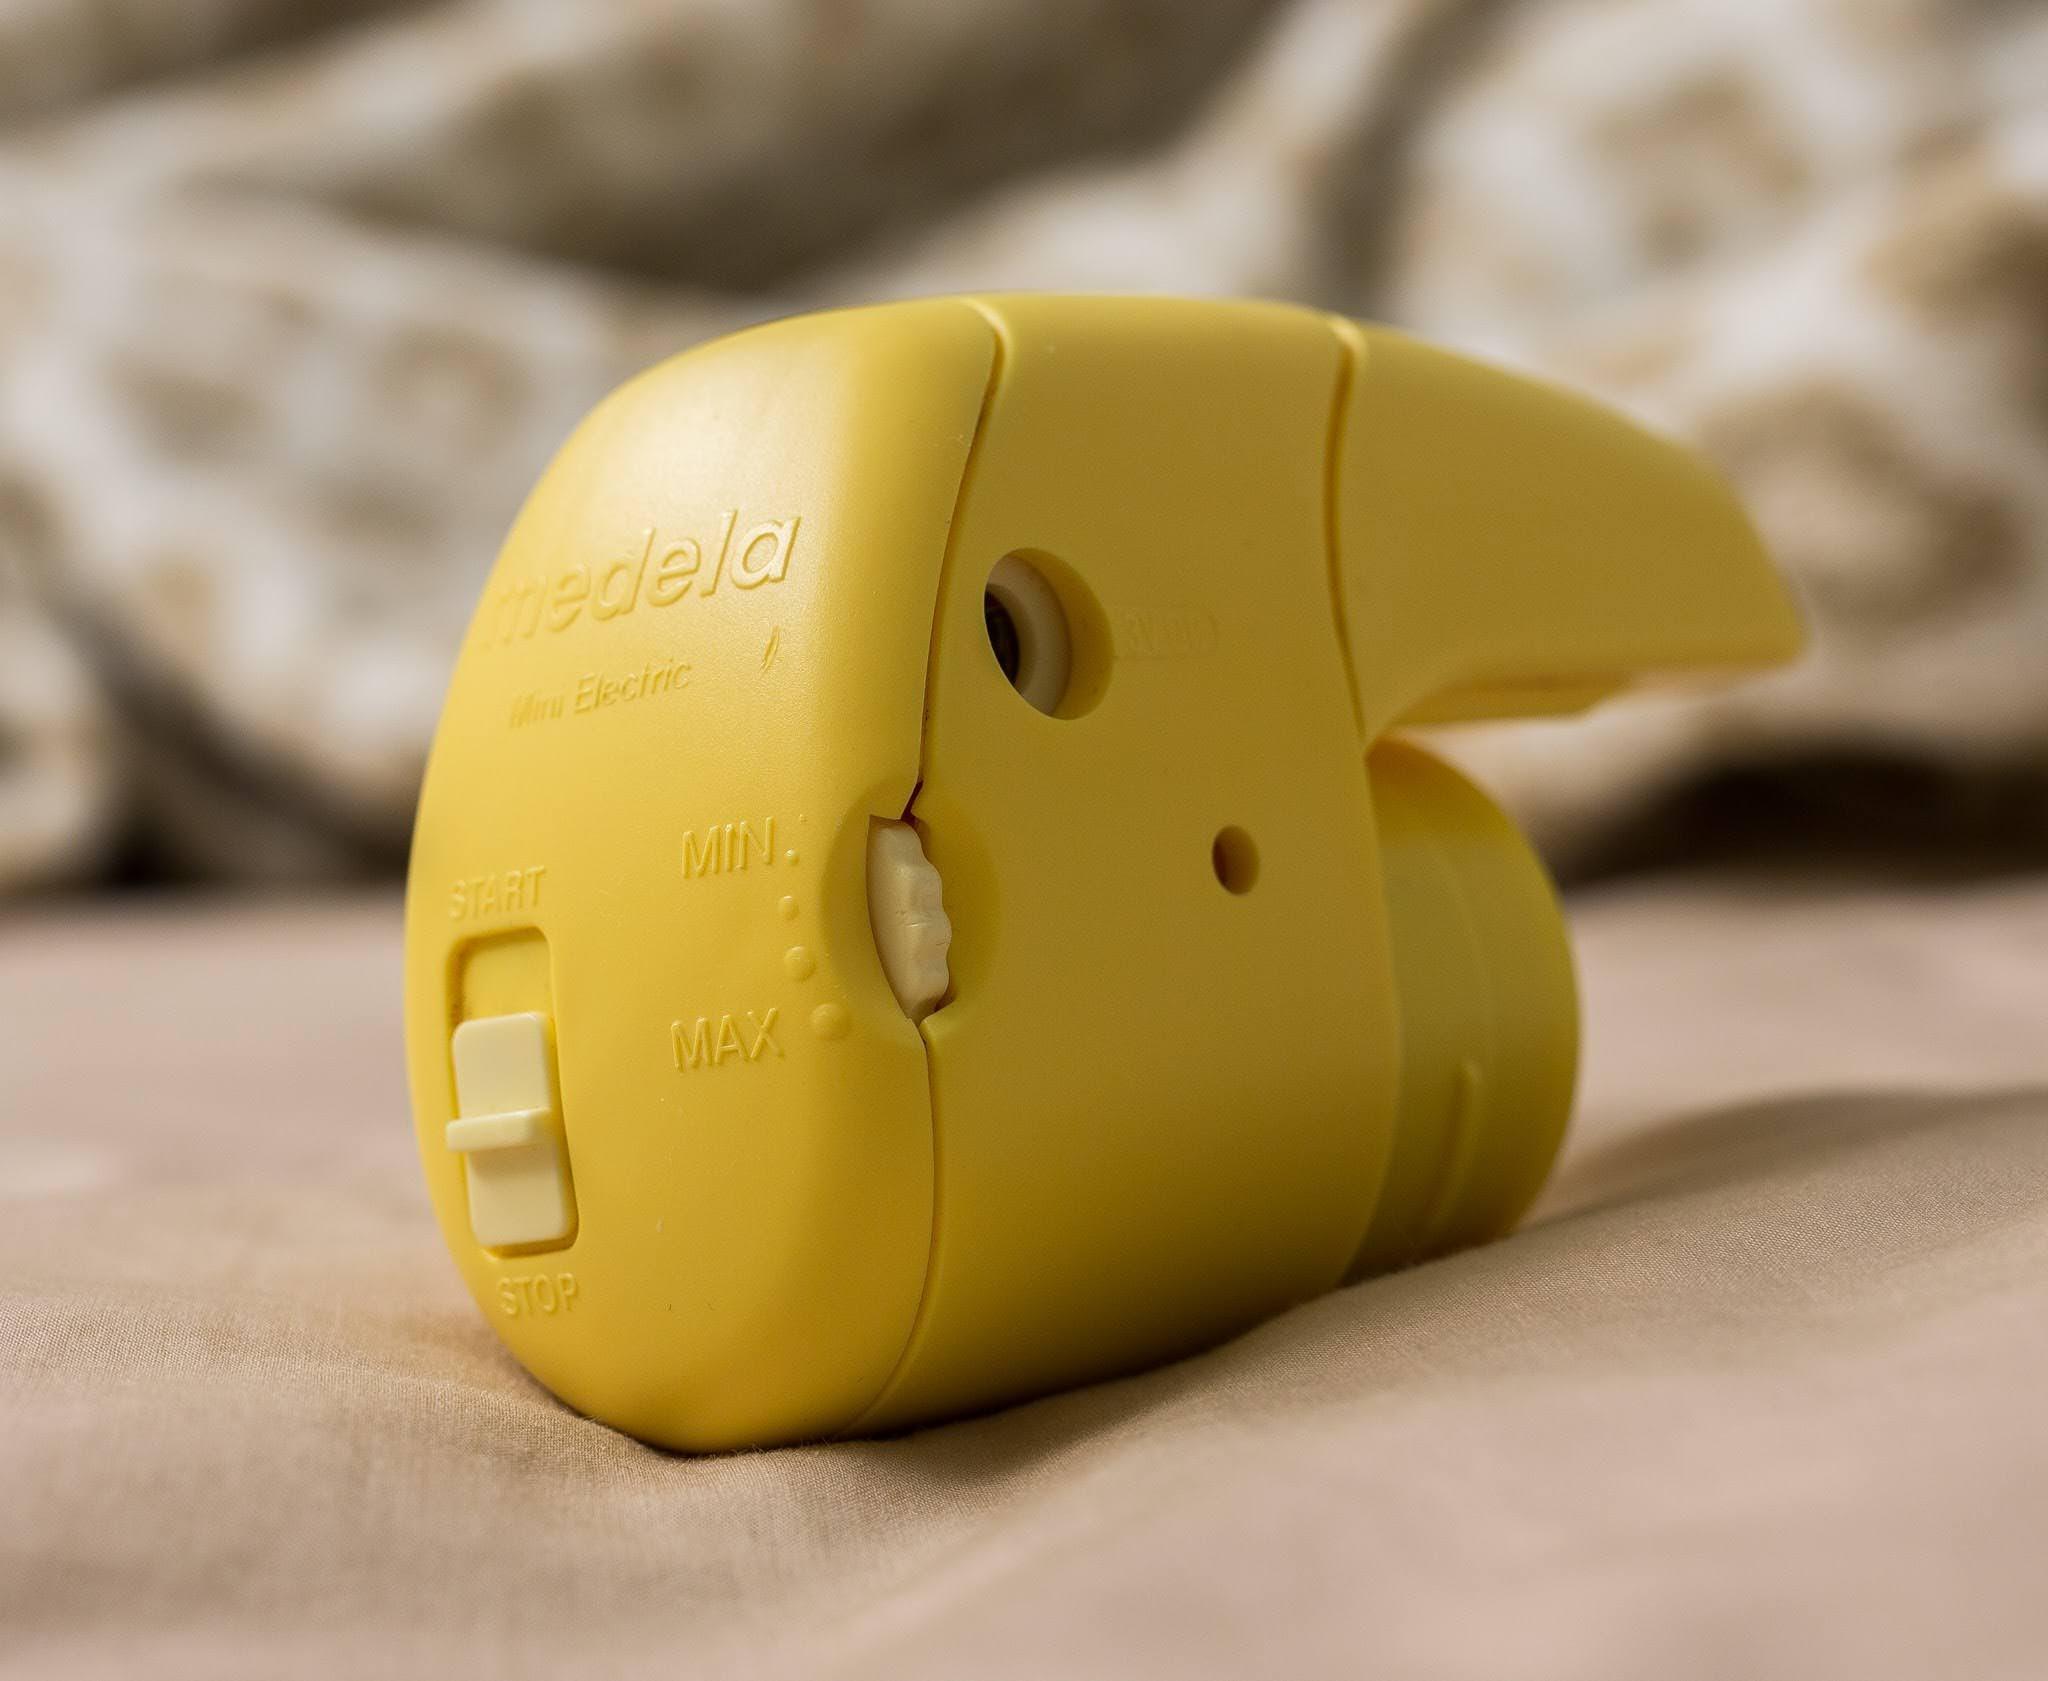 AVENT新安怡雙邊電動吸乳器,PHILIPS AVENT 新安怡 雙邊電動吸乳器...再次推薦給想餵母奶的媽媽